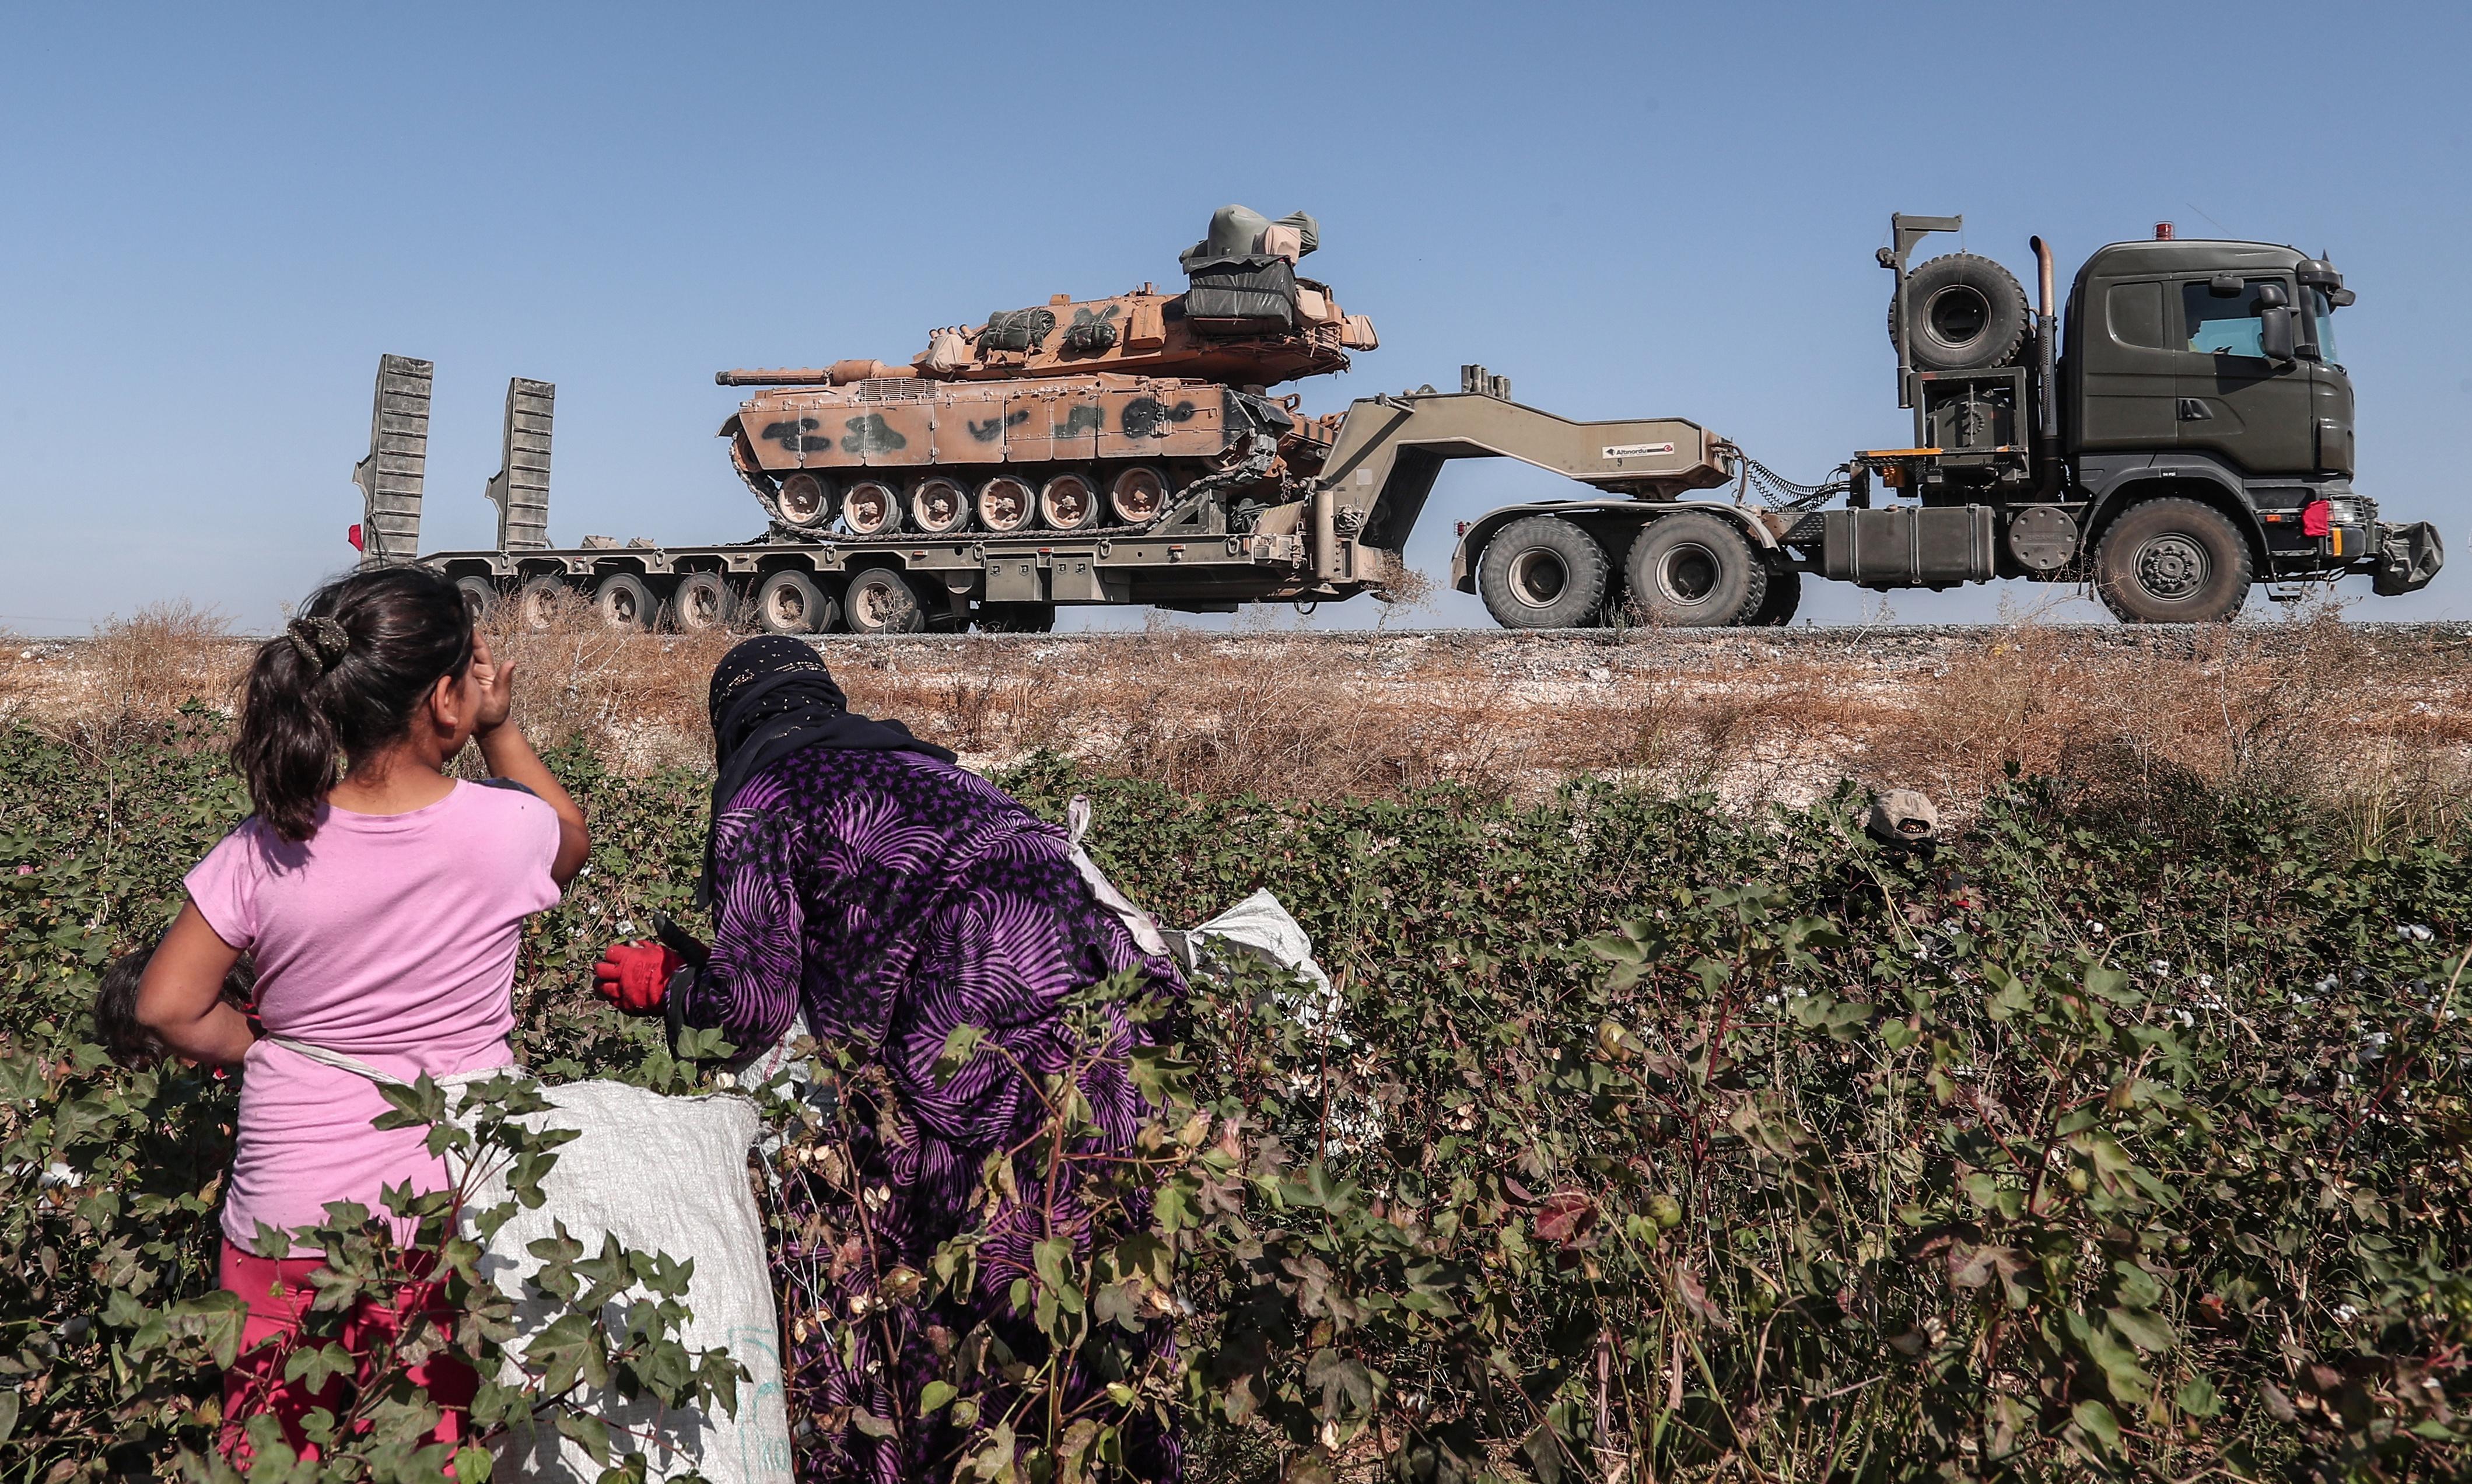 Betrayal on the border: Kurds fear future as Turkish assault intensifies